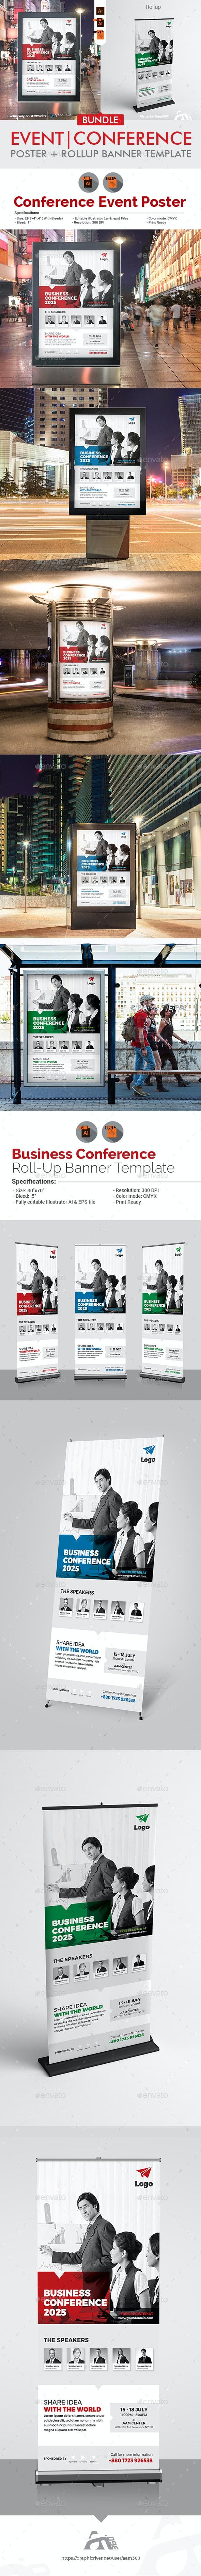 Event/Conference Signage Bundle - Signage Print Templates